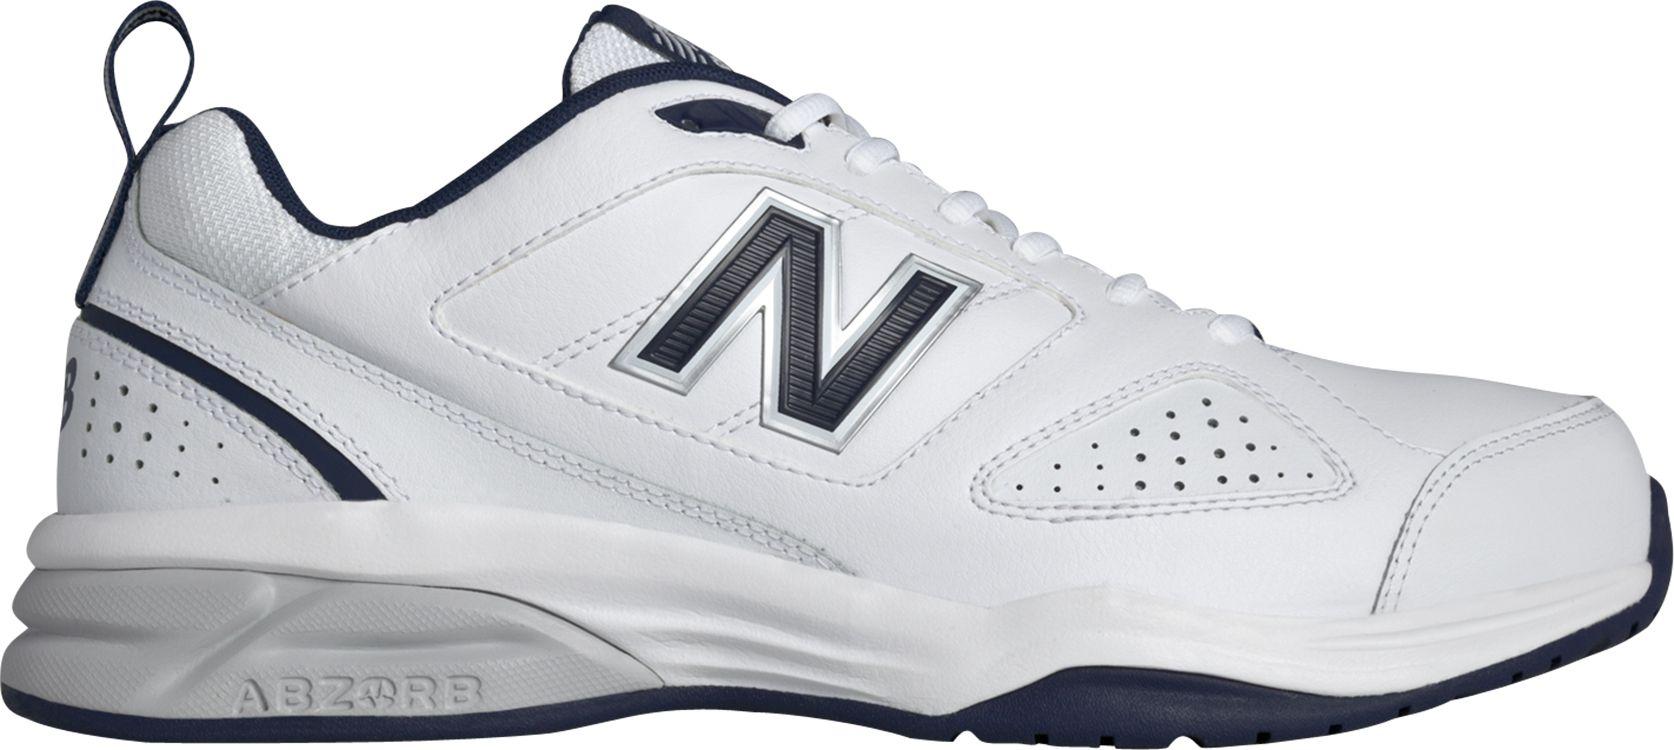 f2eb66182e6ee New Balance Men's 623v3 Training Shoes | DICK'S Sporting ...